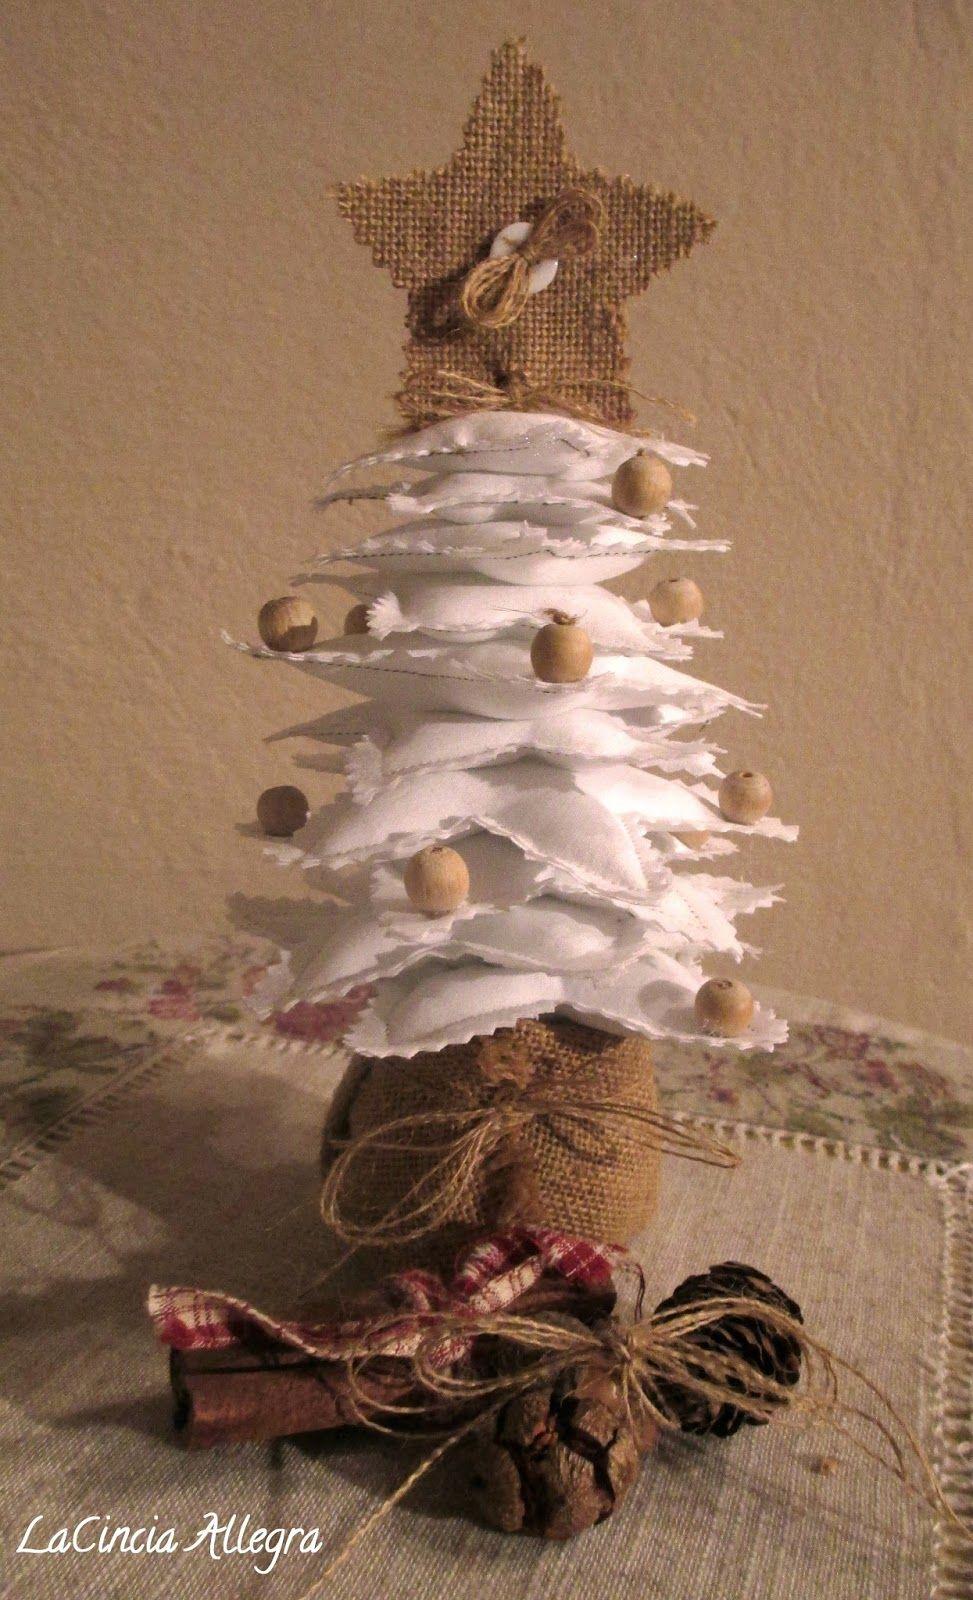 Stella Stellina Di Natale.La Cincia Allegra Stella Stellina Natale Si Avvicina